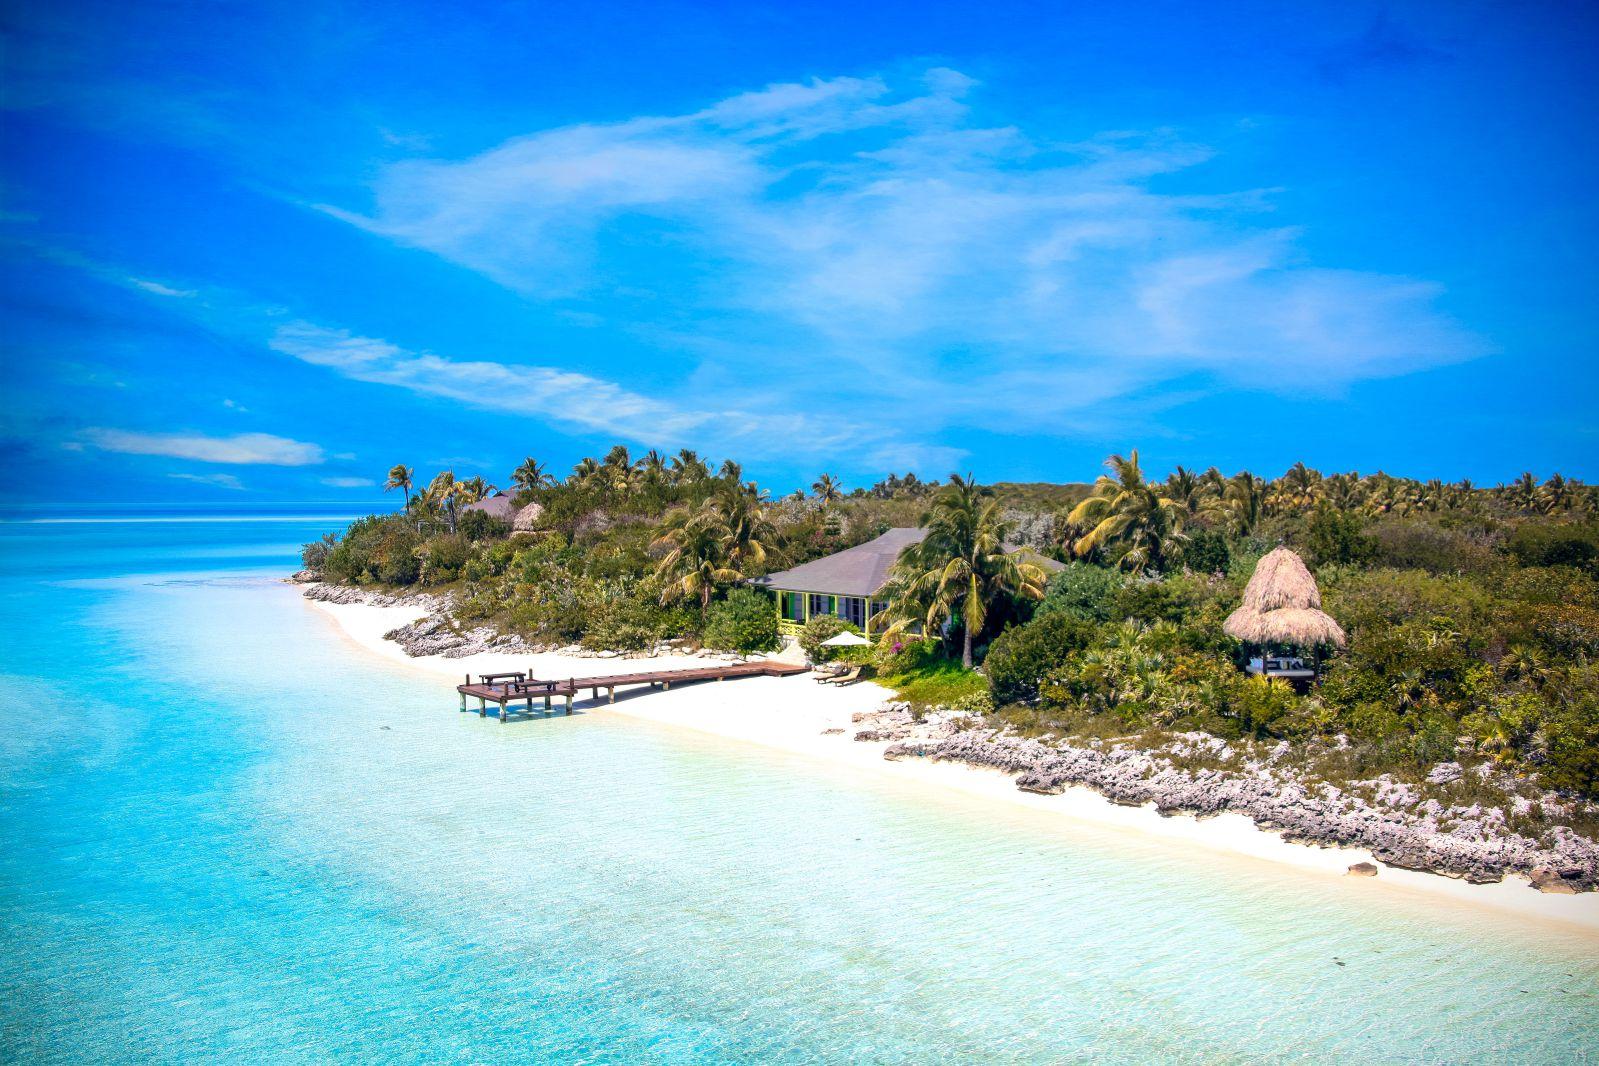 private-island-bahamas-caribbean-musha-cay-cov.jpg